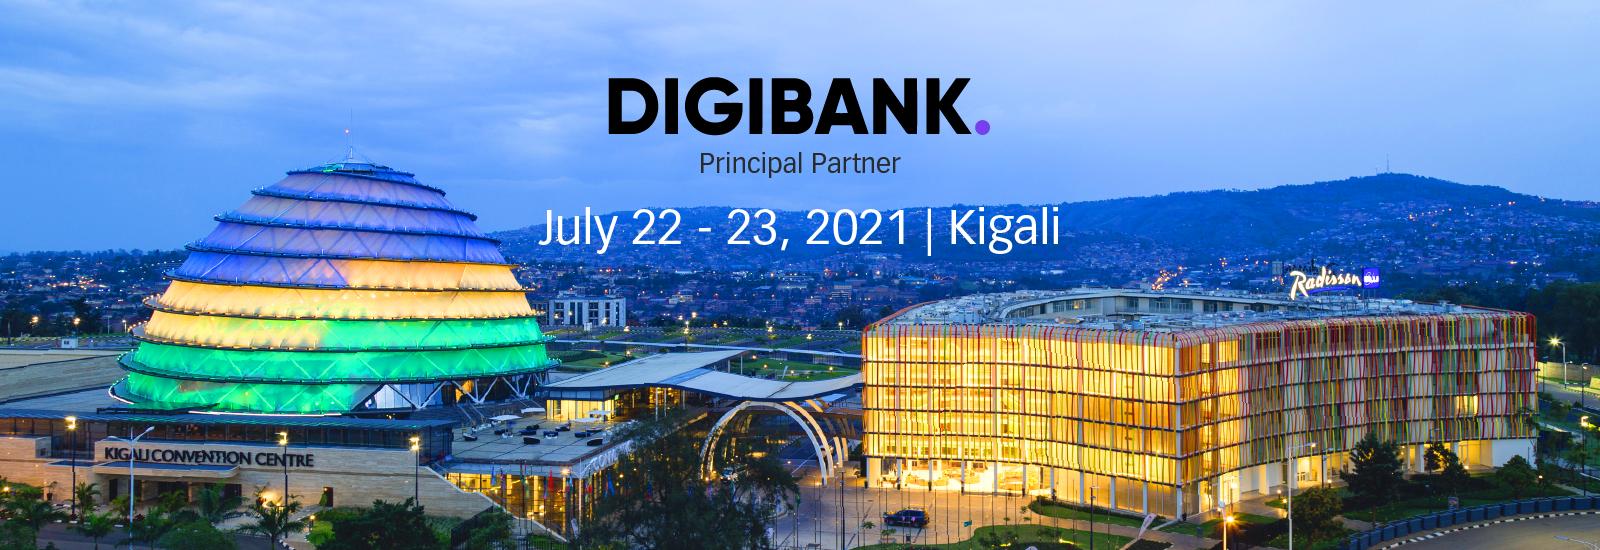 ProgressSoft 在2021年基加利非洲數字銀行峰會上